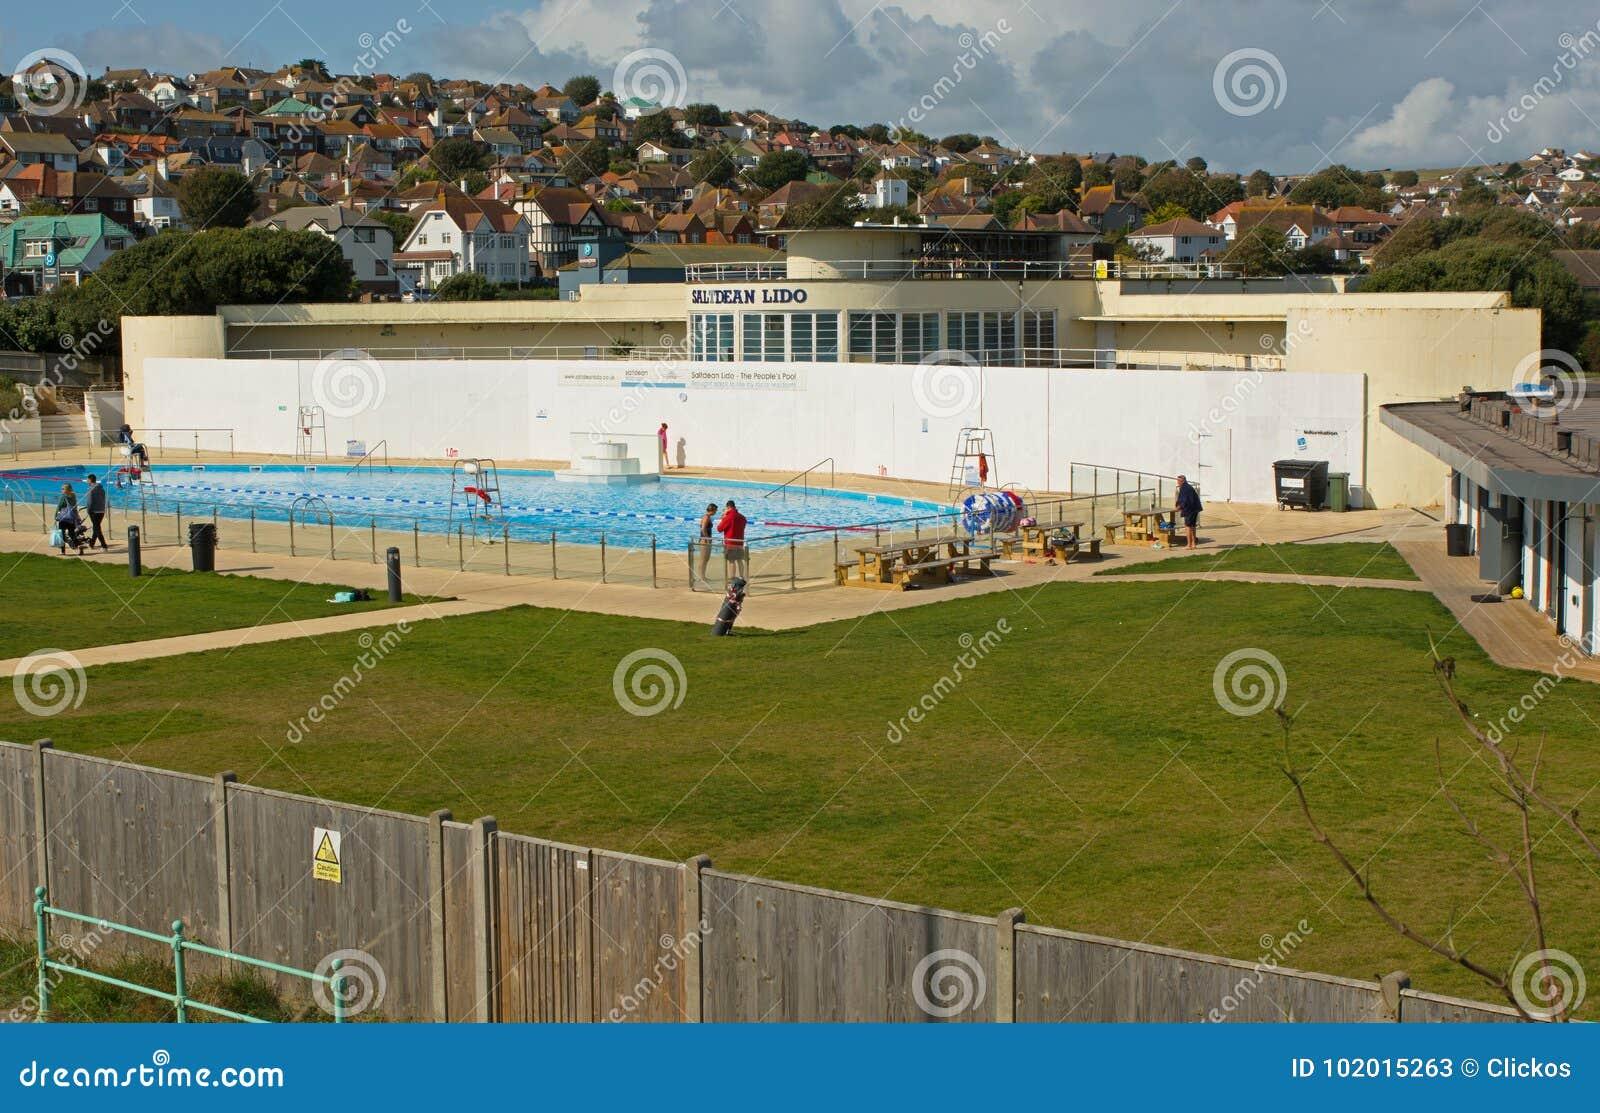 100 Lidos And Outdoor Swimming Pools Tarlair Outdoor Swimming Pool And Boating Pond 1920s Art